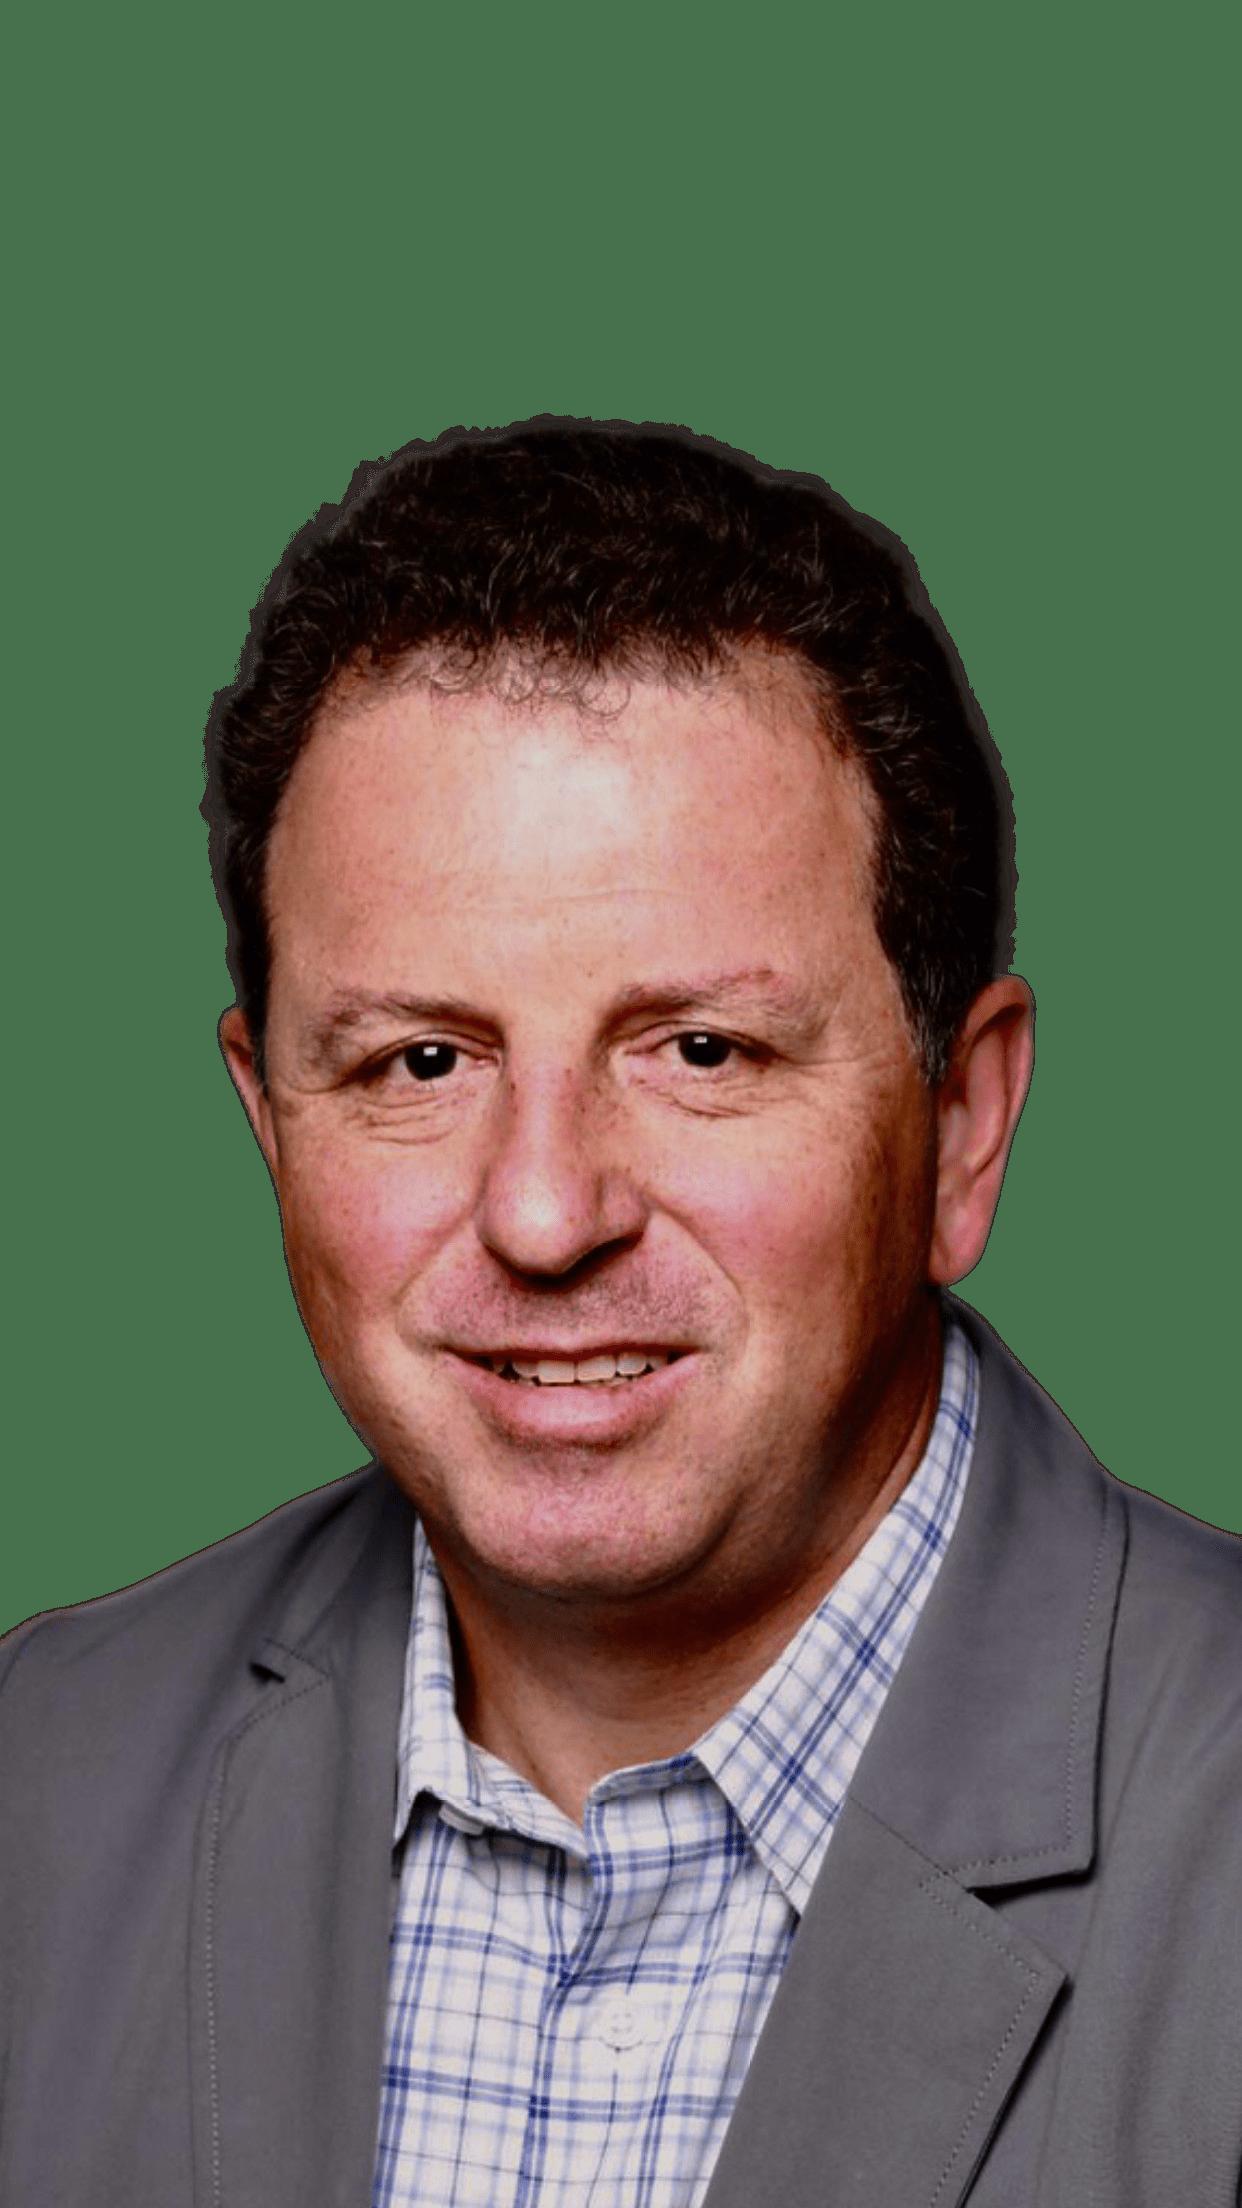 The speaker Phil Redman's profile image